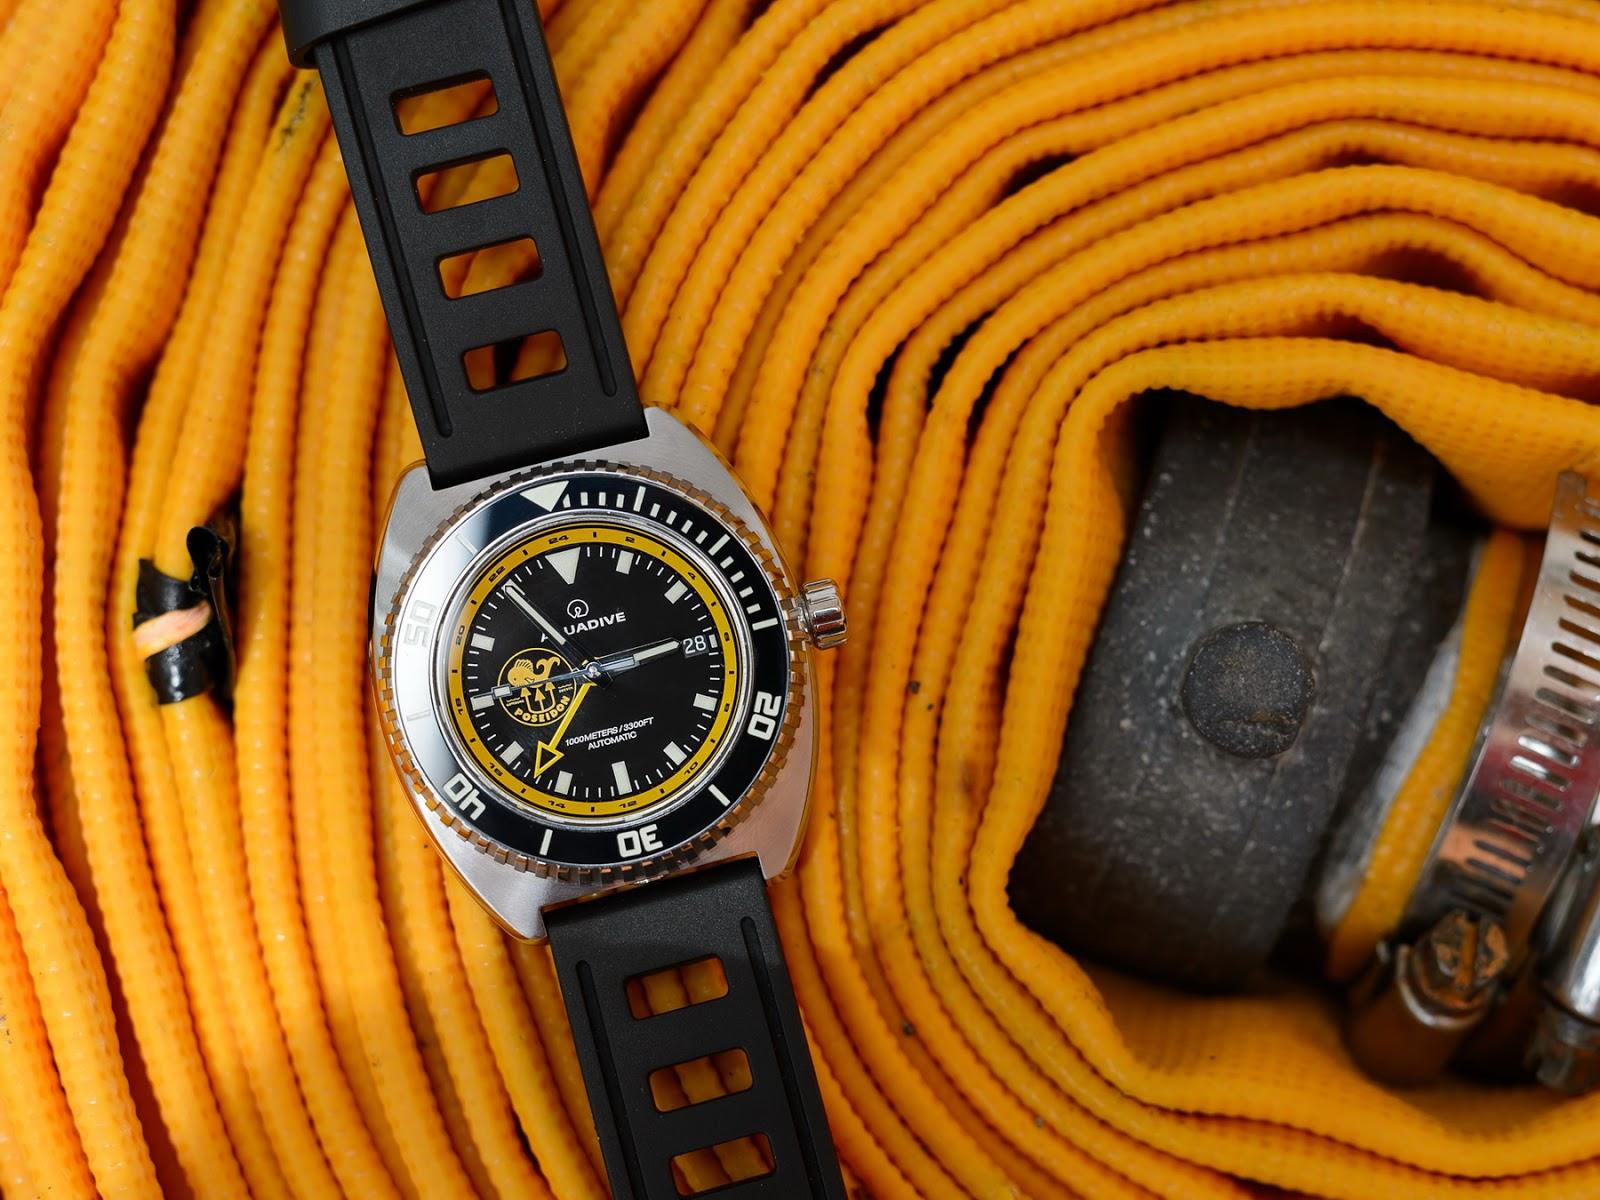 Aquadive's new Poseidon GMT AQUADIVE+Bathyscaphe+100+GMT+POSEIDON+12